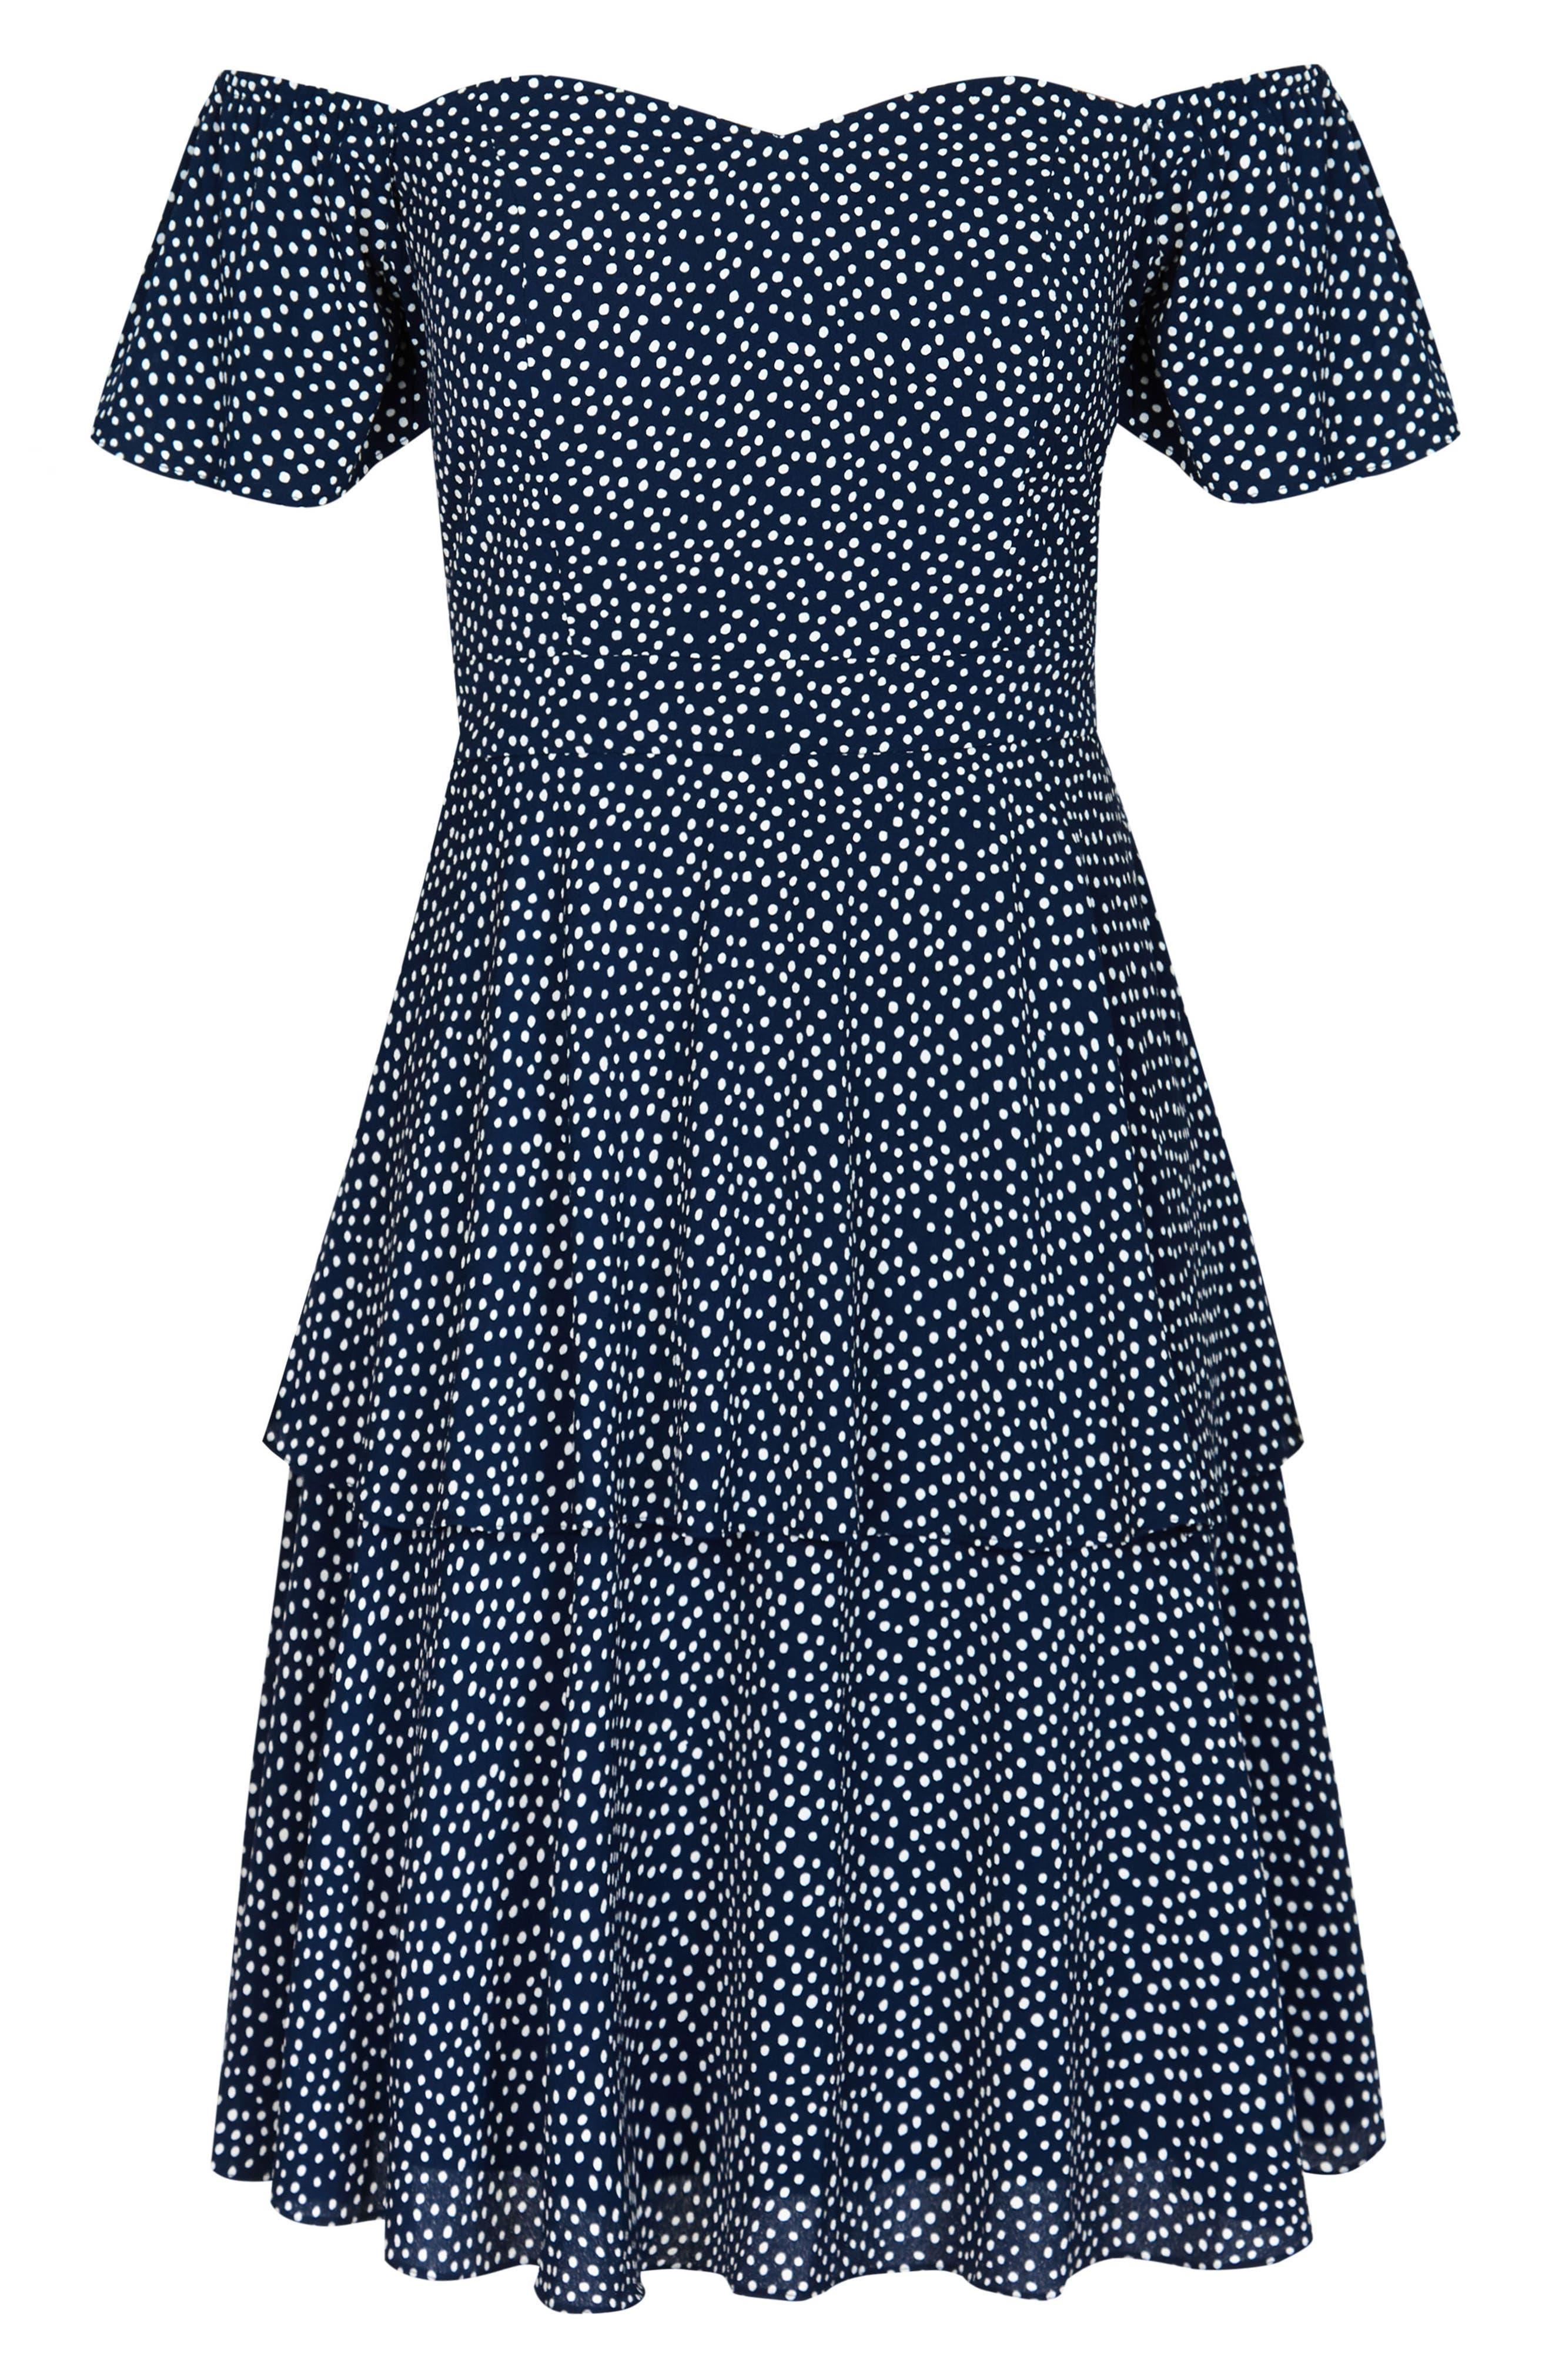 Spot Off the Shoulder Dress,                             Alternate thumbnail 3, color,                             NAVY SPOT